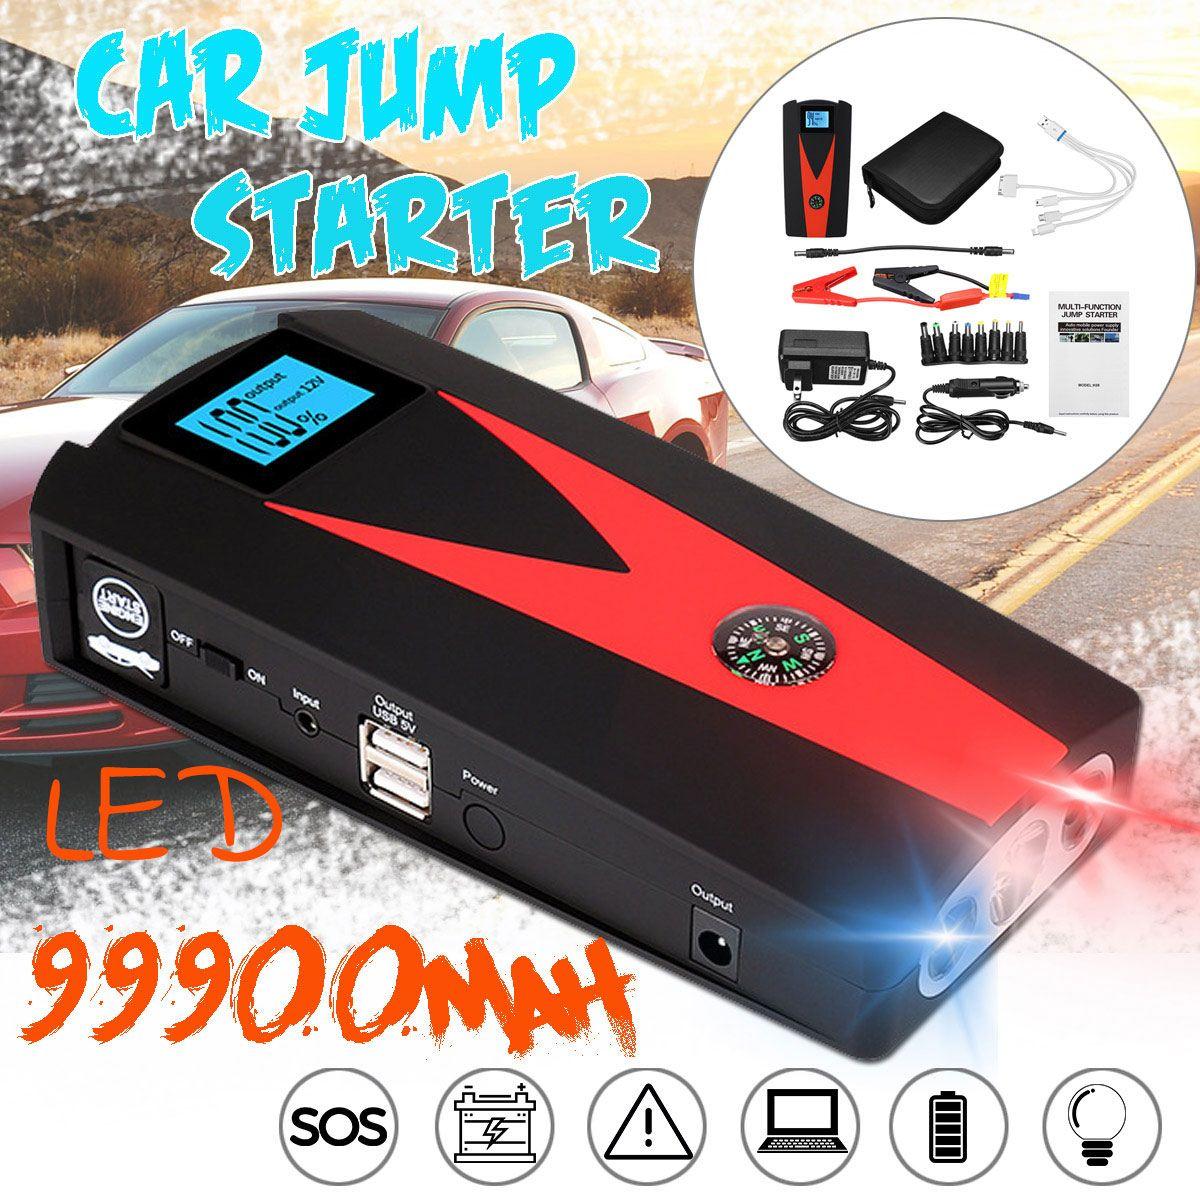 Mini Portable 12V 99900mAh Car Jump Starter Battery USB Charger Emergency Power Bank SOS LED For Starting Device